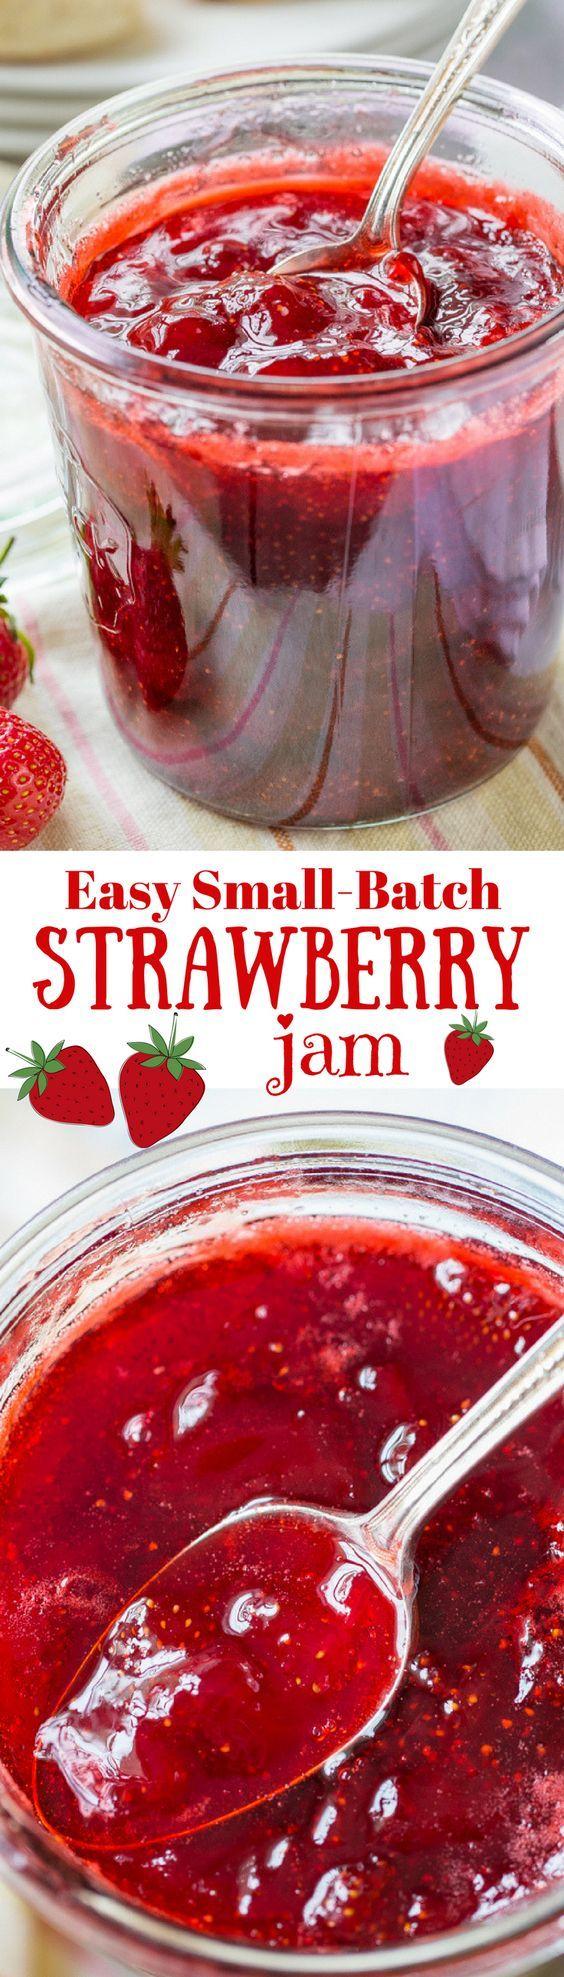 Easy Small-Batch Spiked Strawberry Jam with Grand Marnier   www.savingdessert.com